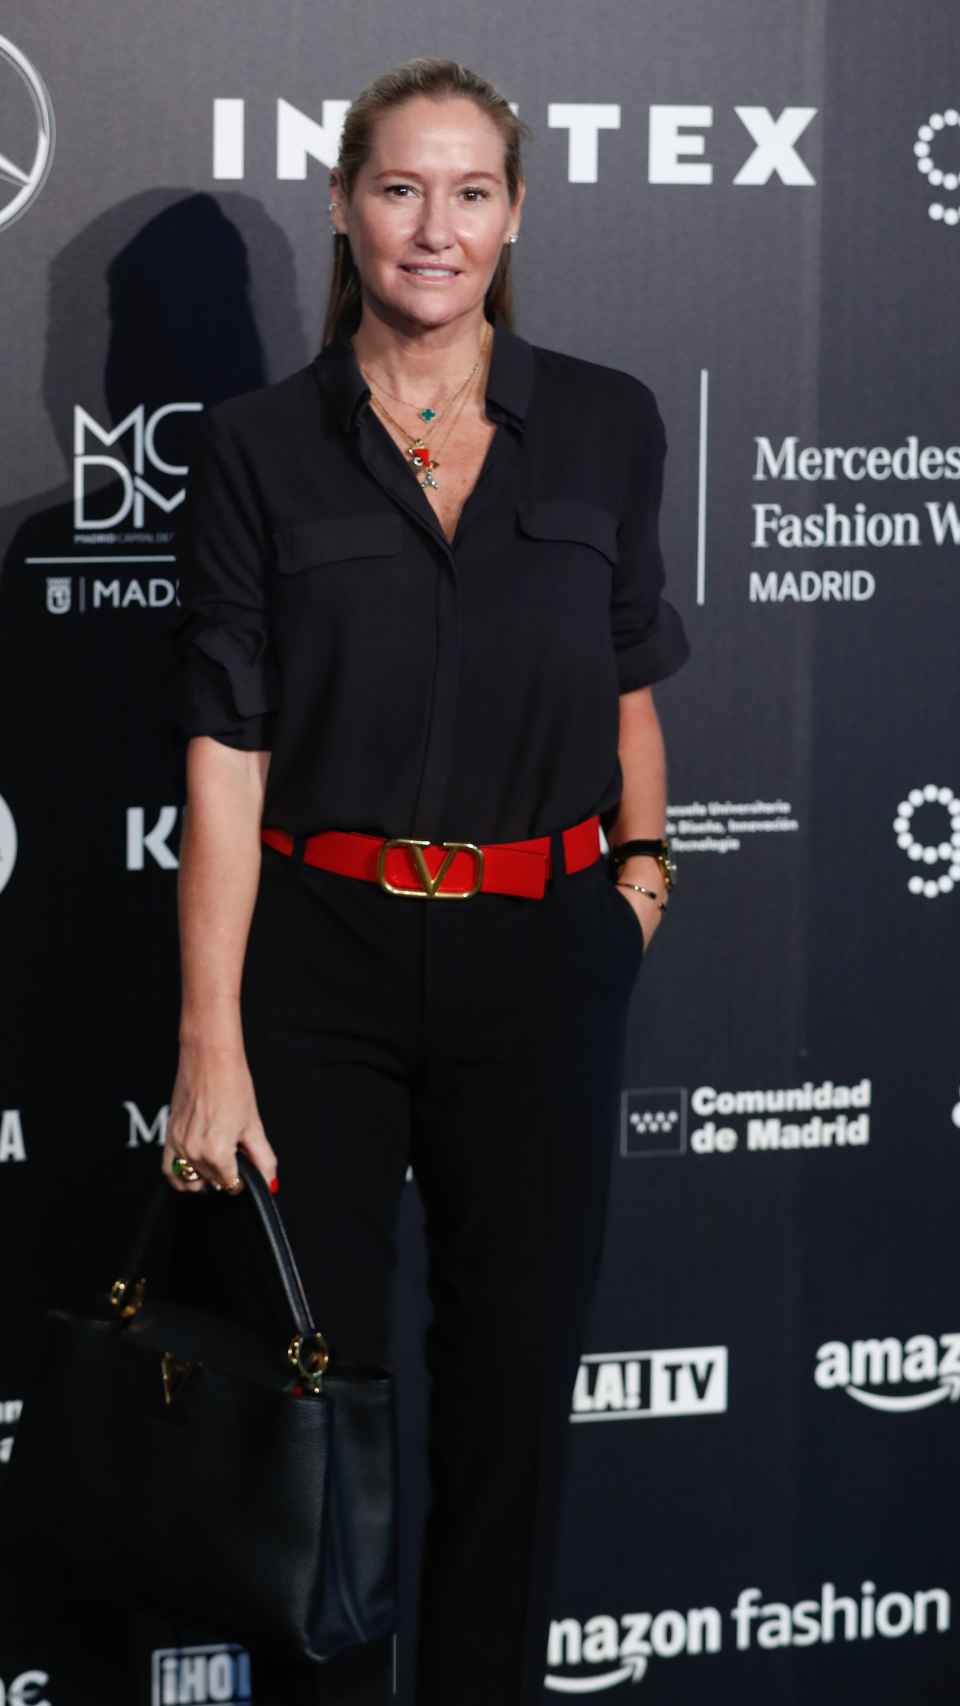 La estilista Fiona Ferrer no se perdió este jueves el arranque de la MBFWM.